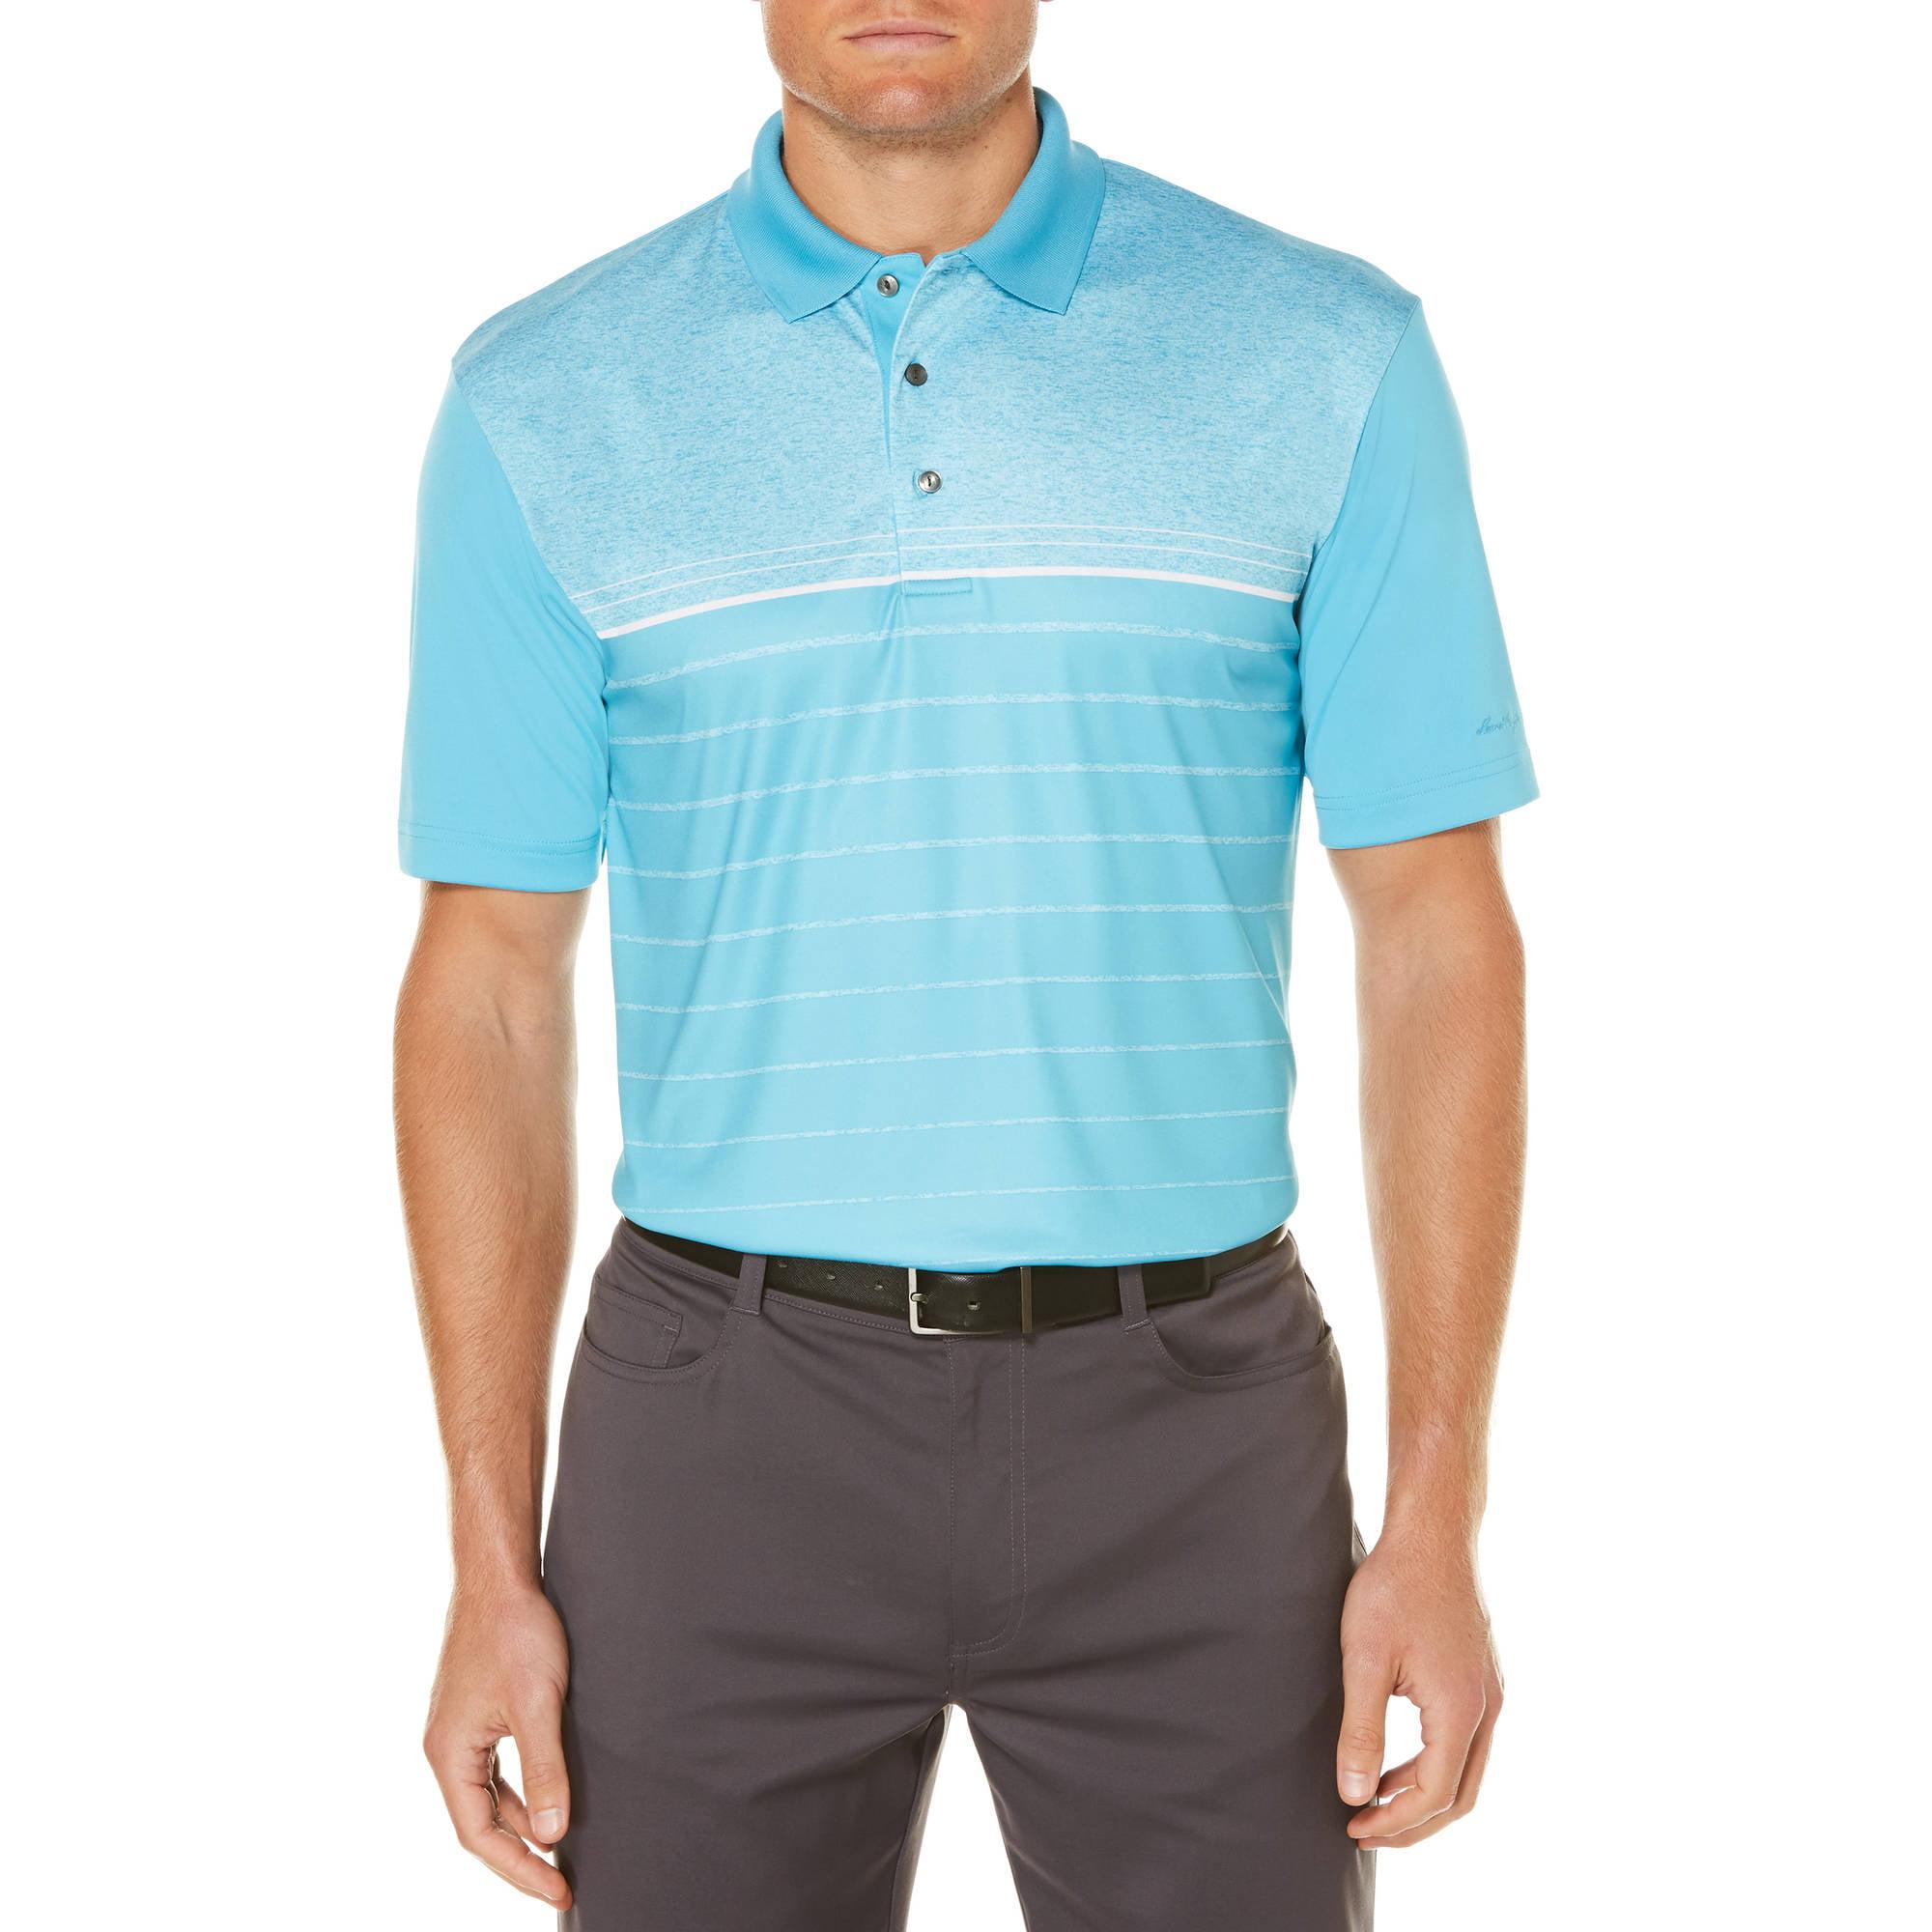 Men's Performance Short Sleeve Heather Print Golf Polo